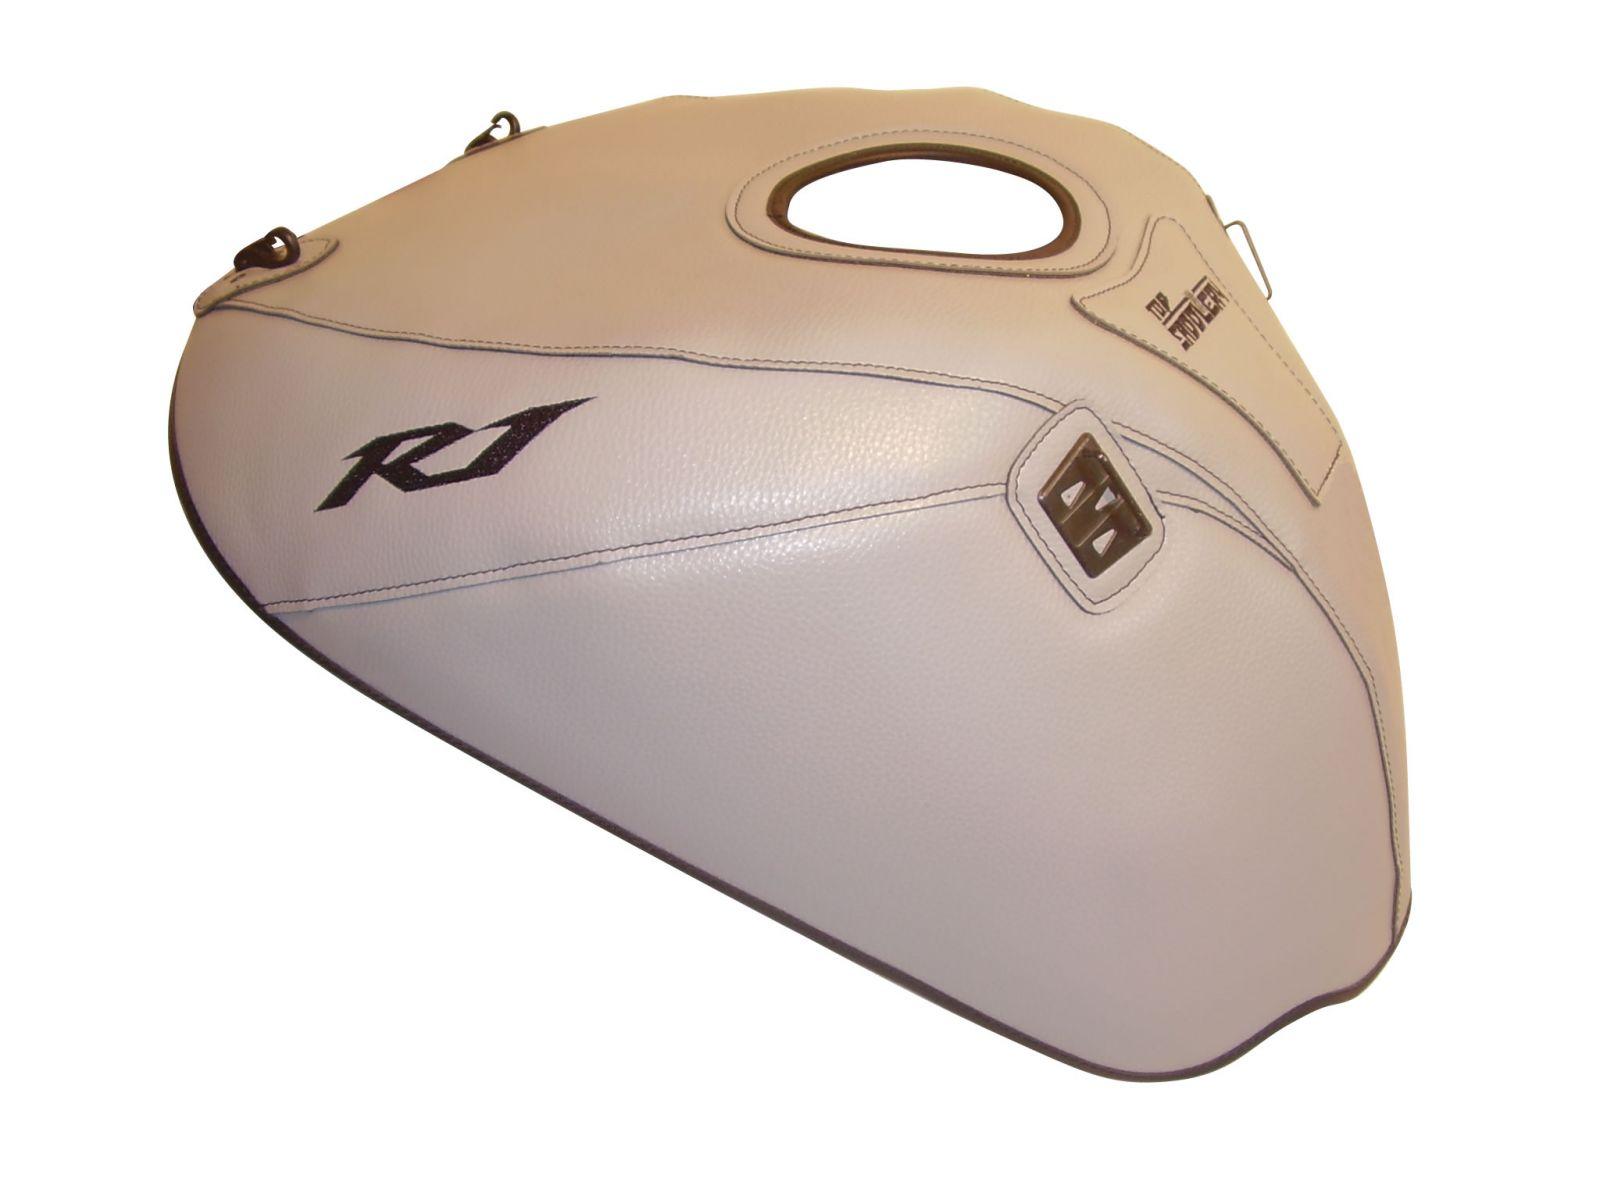 Tapis protège-réservoir TPR2433 - YAMAHA YZF R1 [2002-2003]